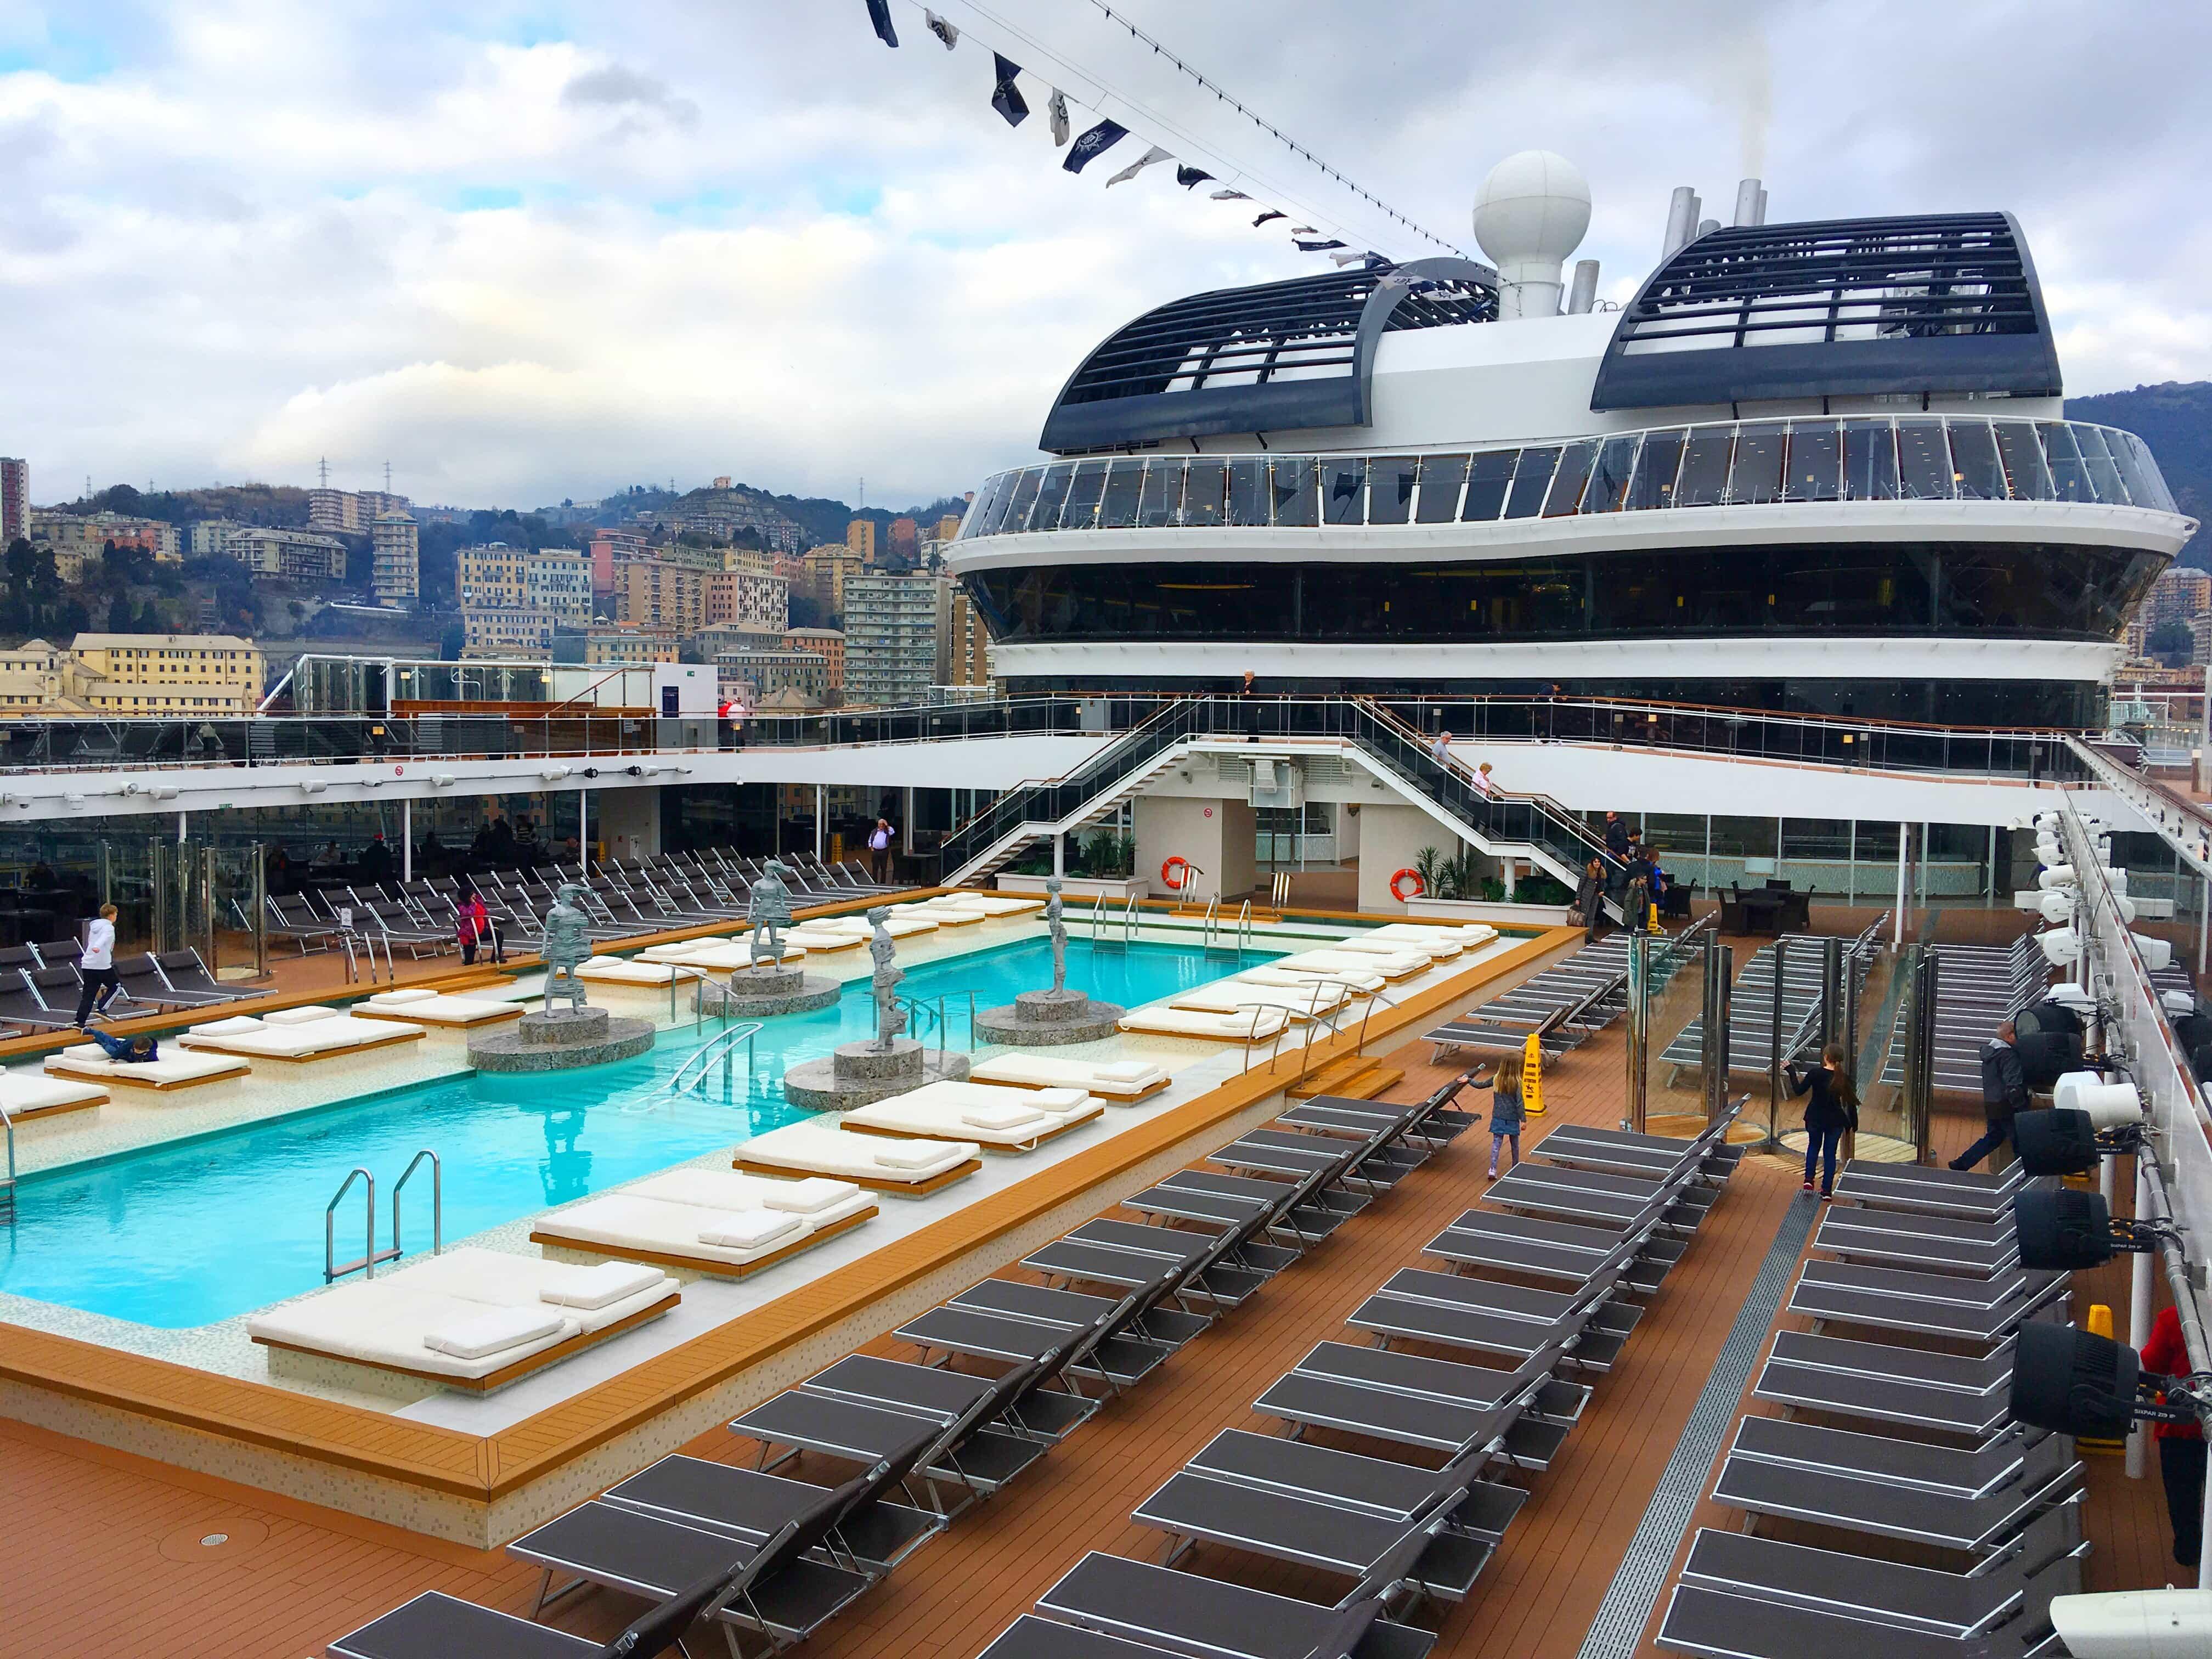 MSC Meraviglia Top Deck Swimming pool and sun loungers